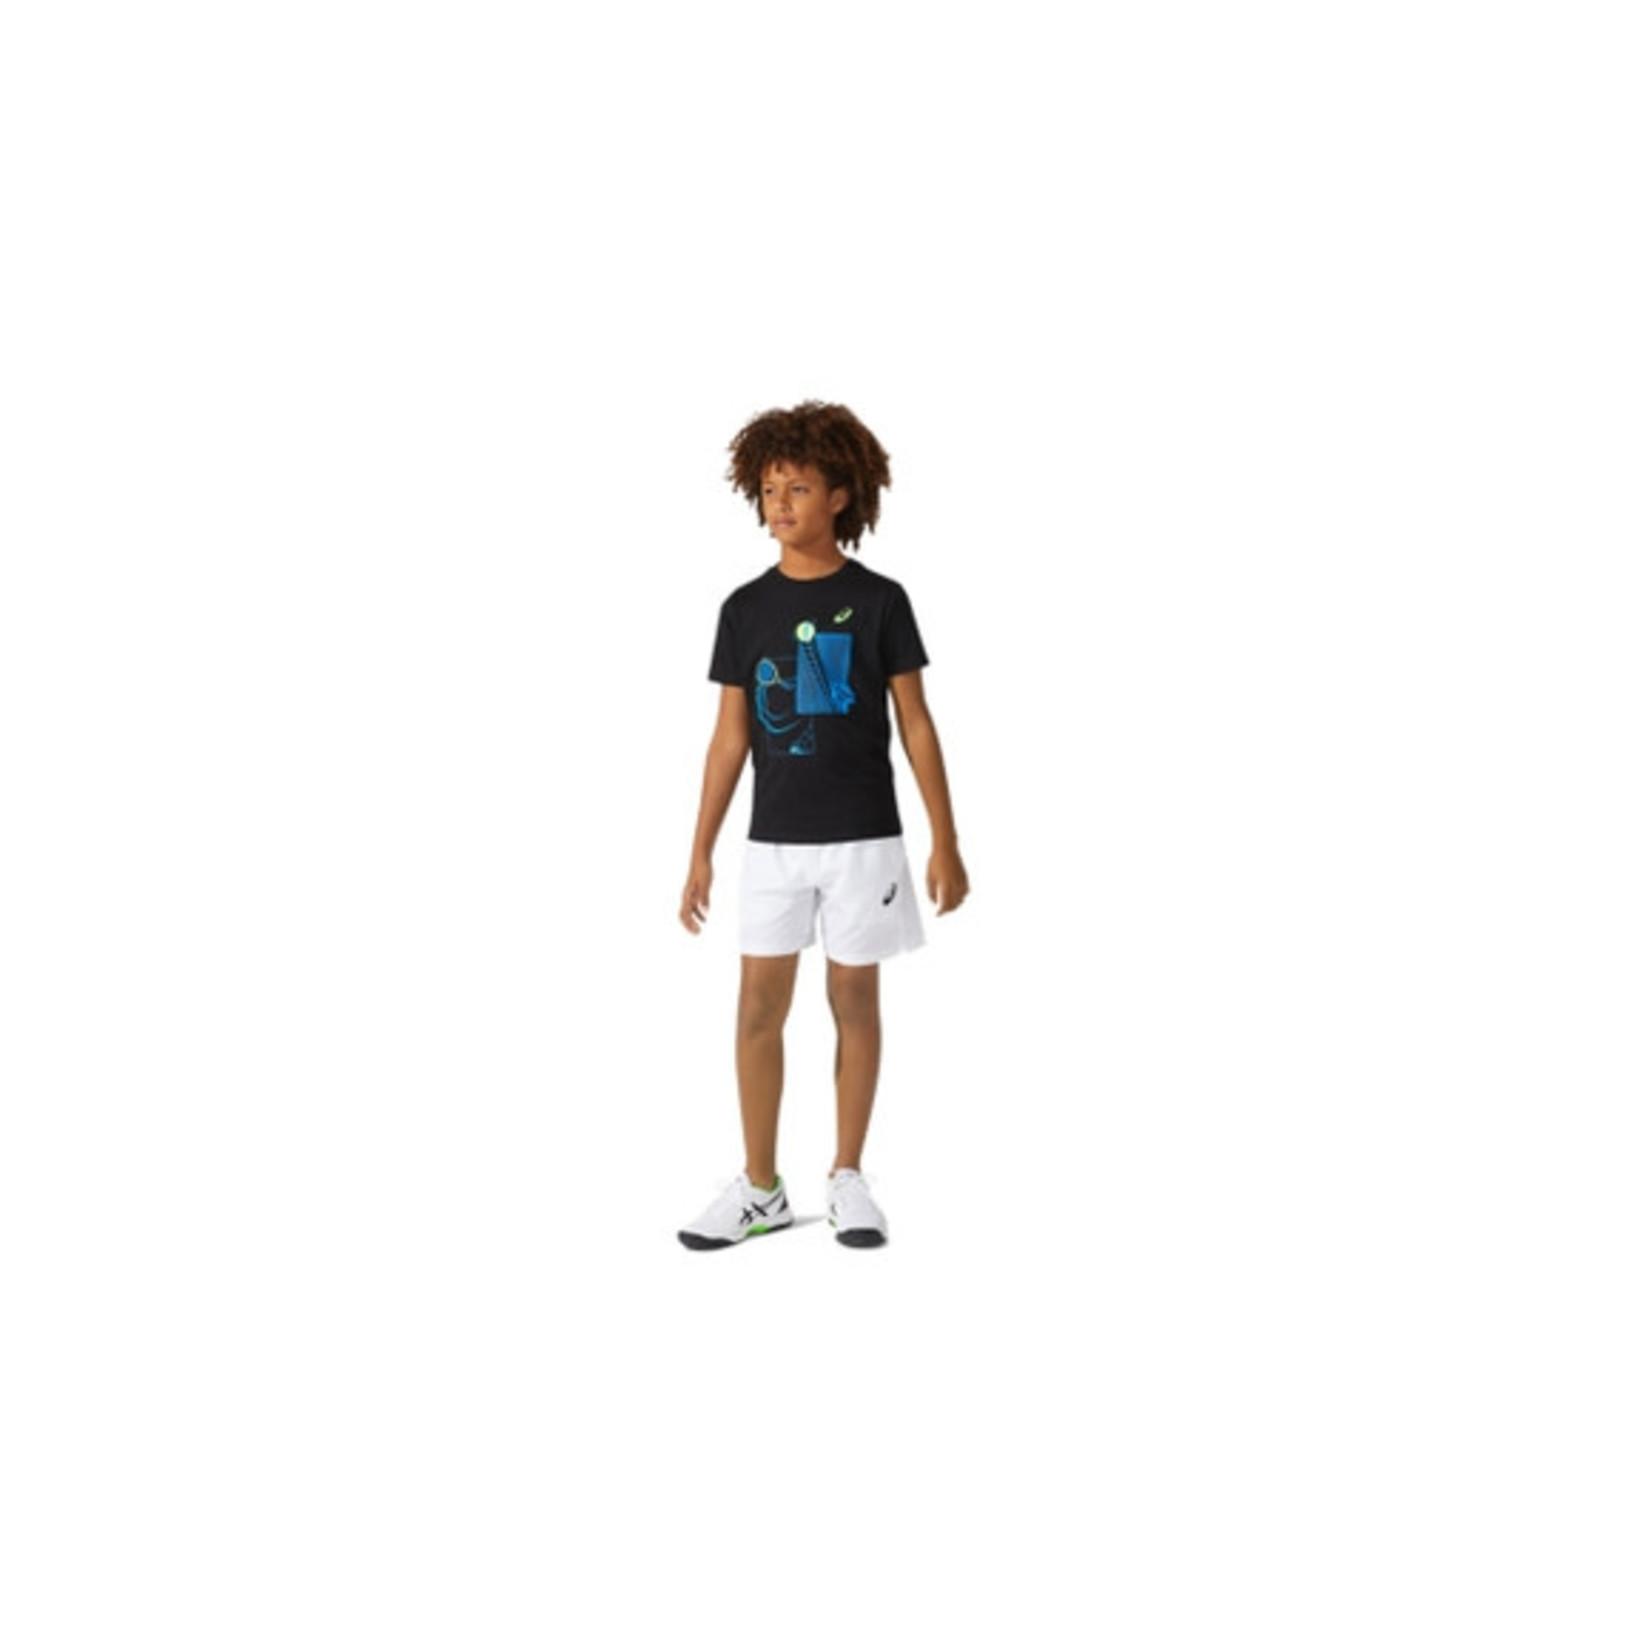 Asics Jongens - Tennis T-shirt